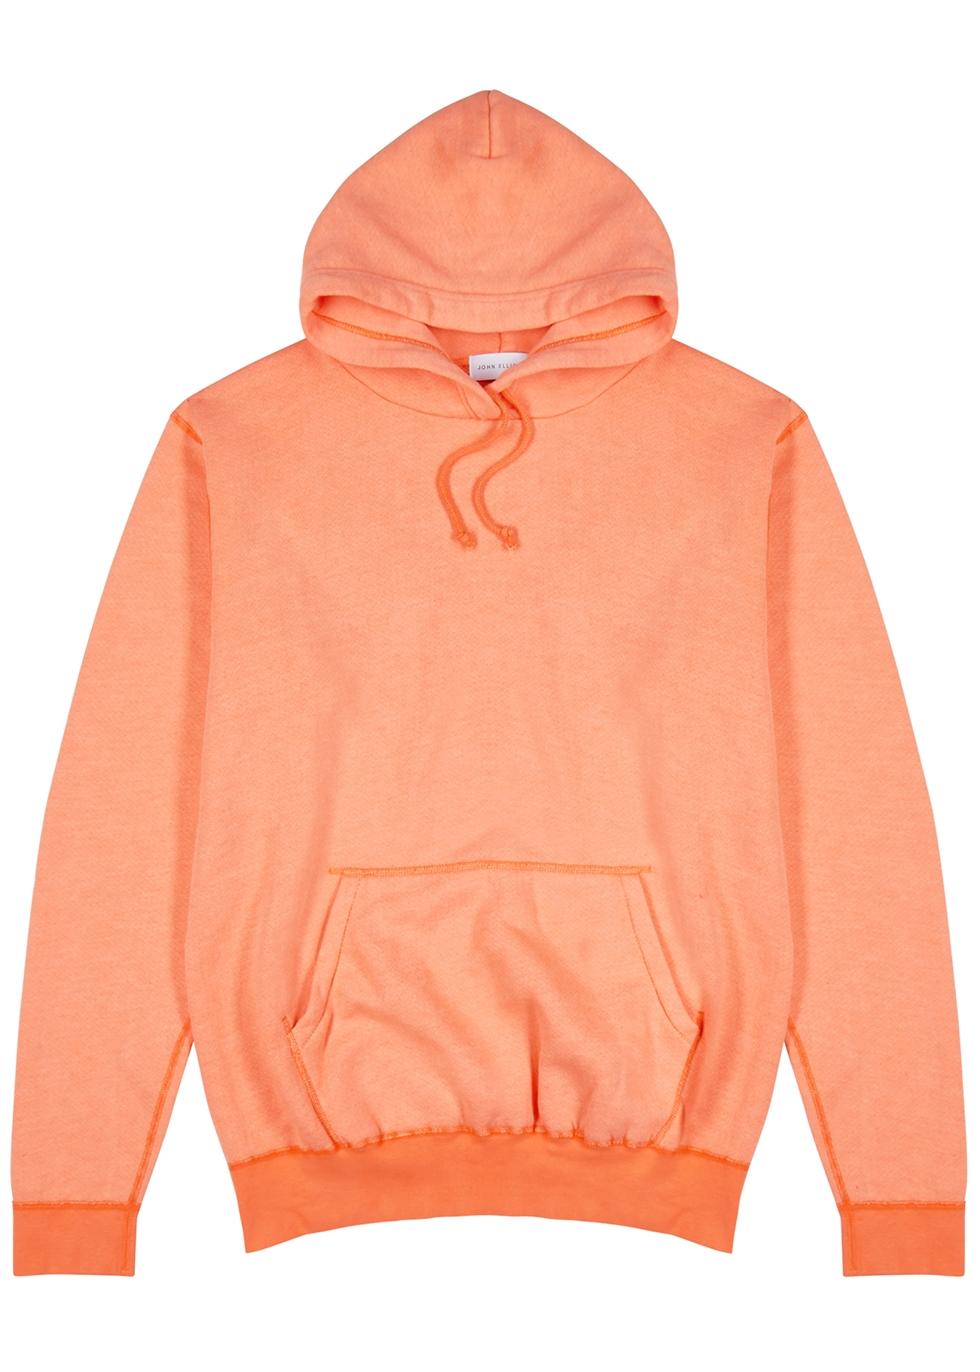 Orange cotton-blend sweatshirt - John Elliott